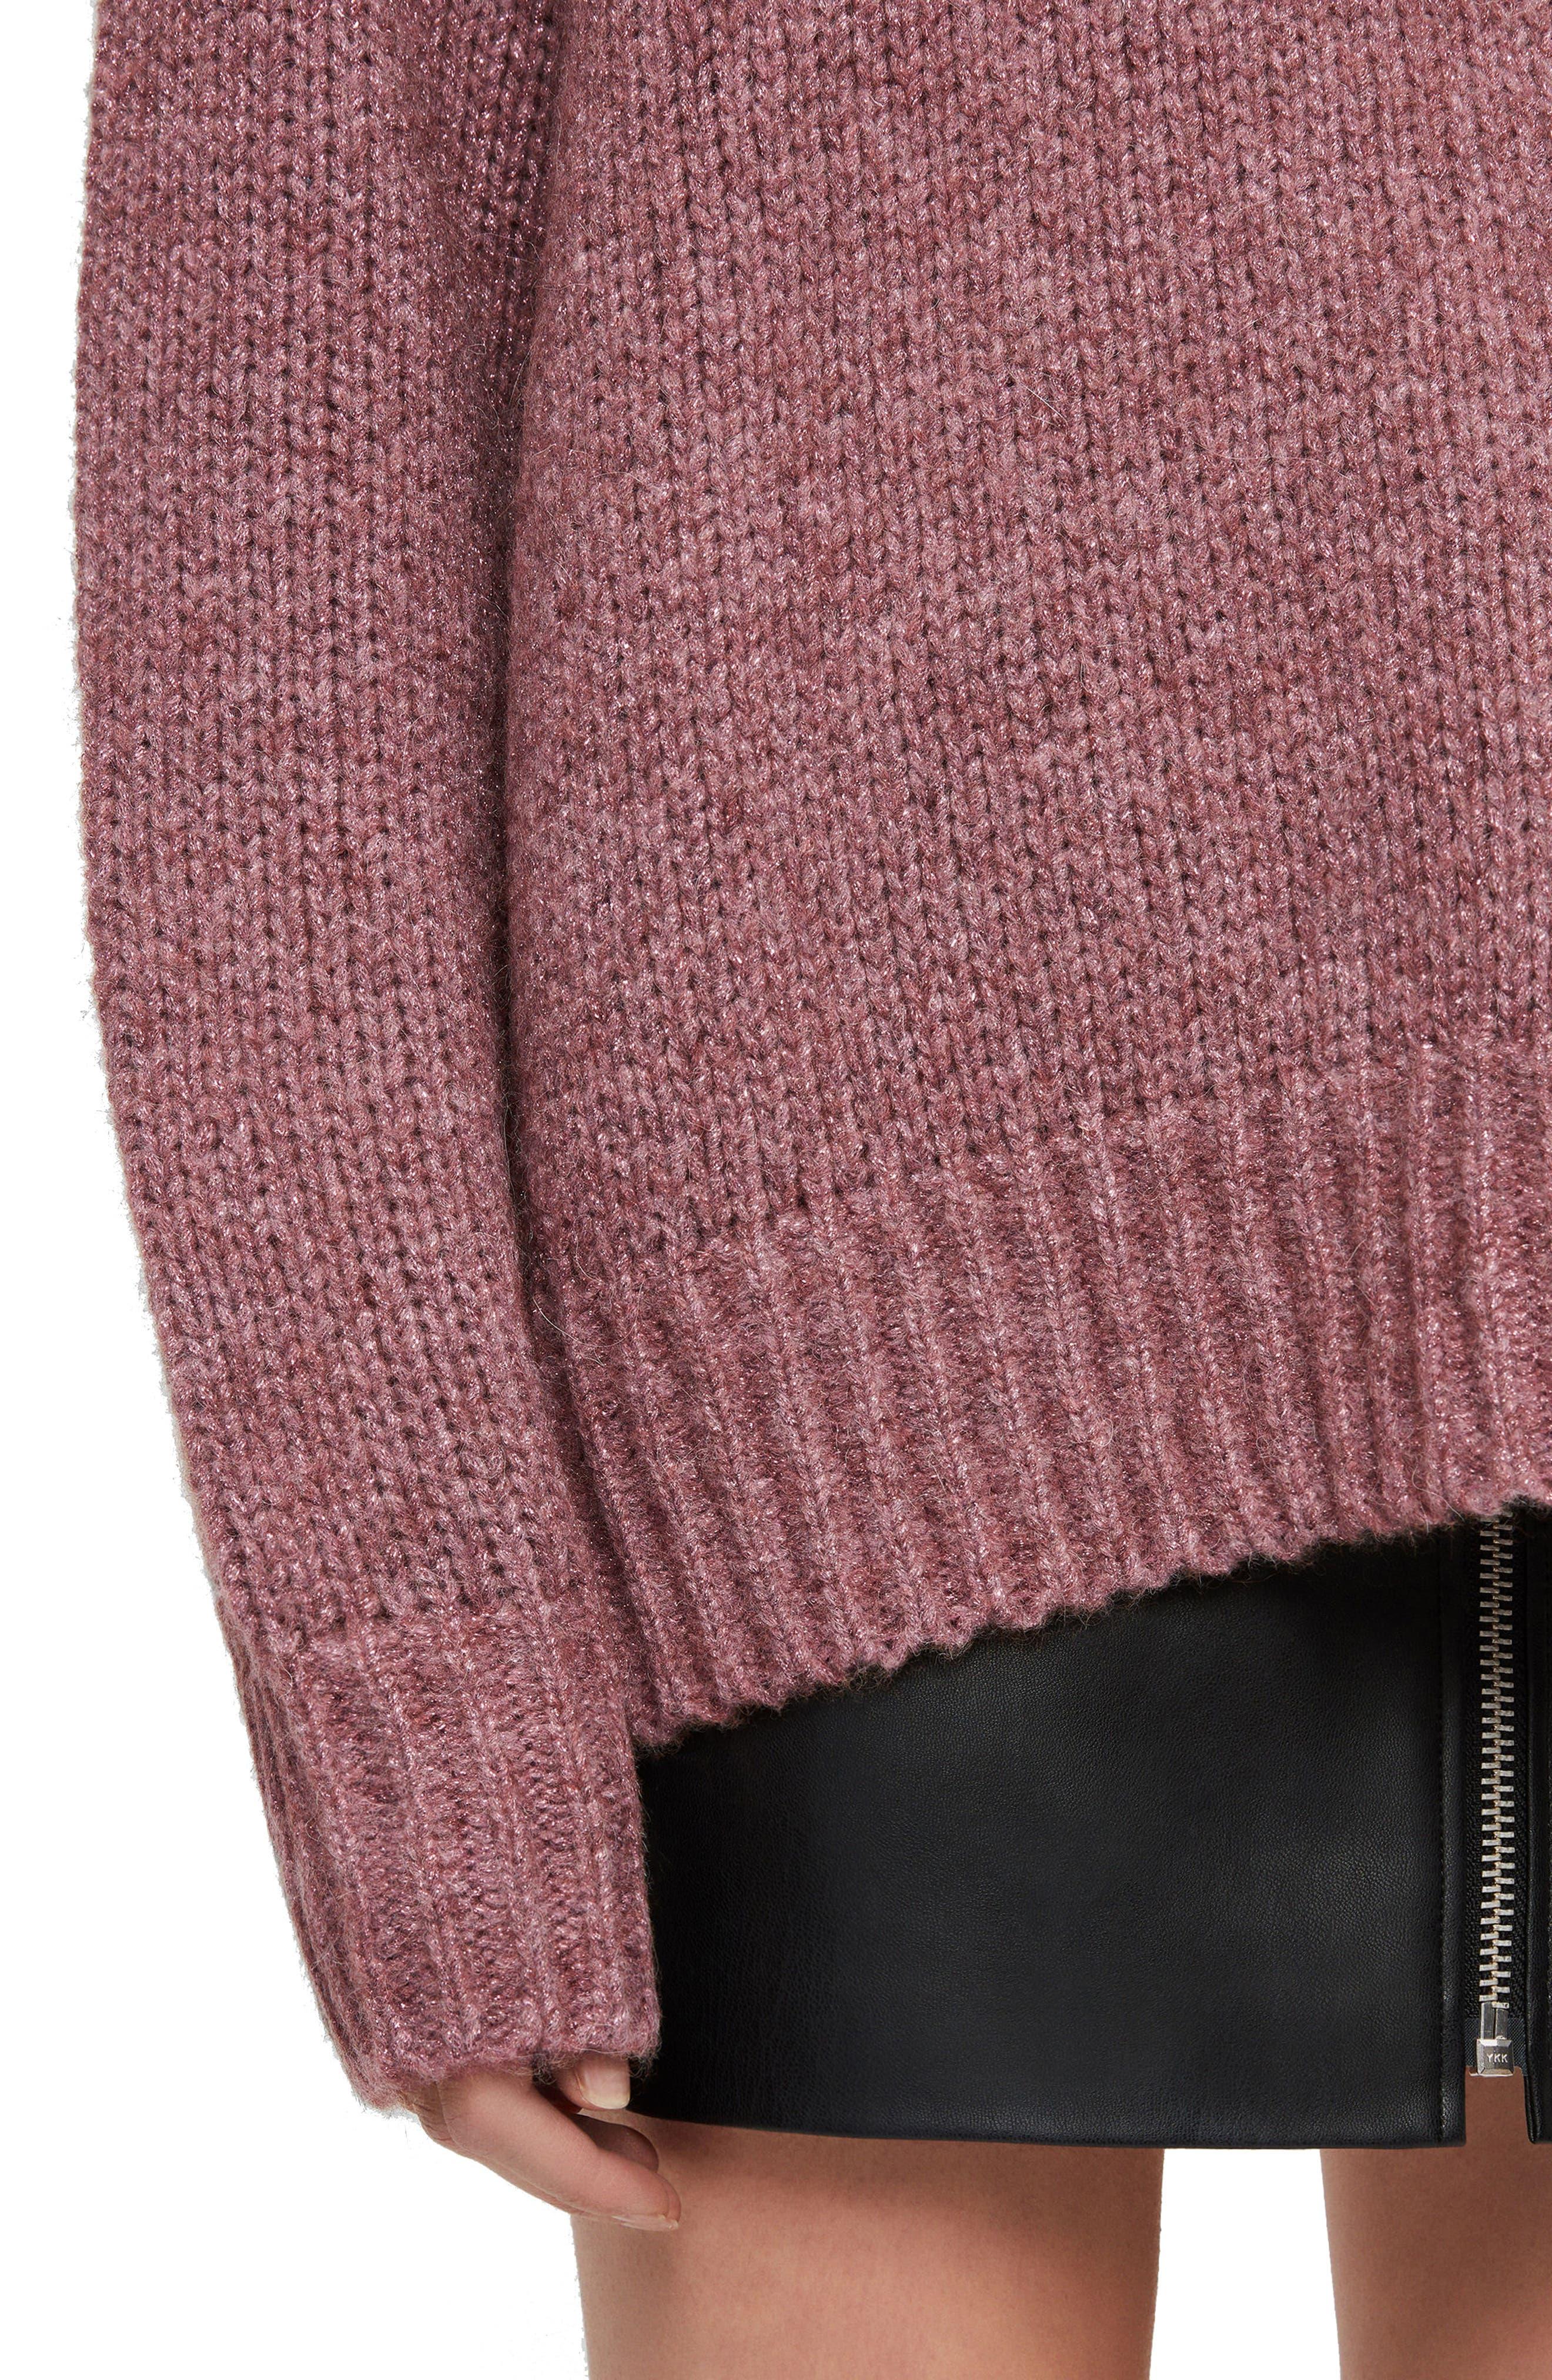 ALLSAINTS, Gemini Metallic Knit Sweater, Alternate thumbnail 4, color, 653